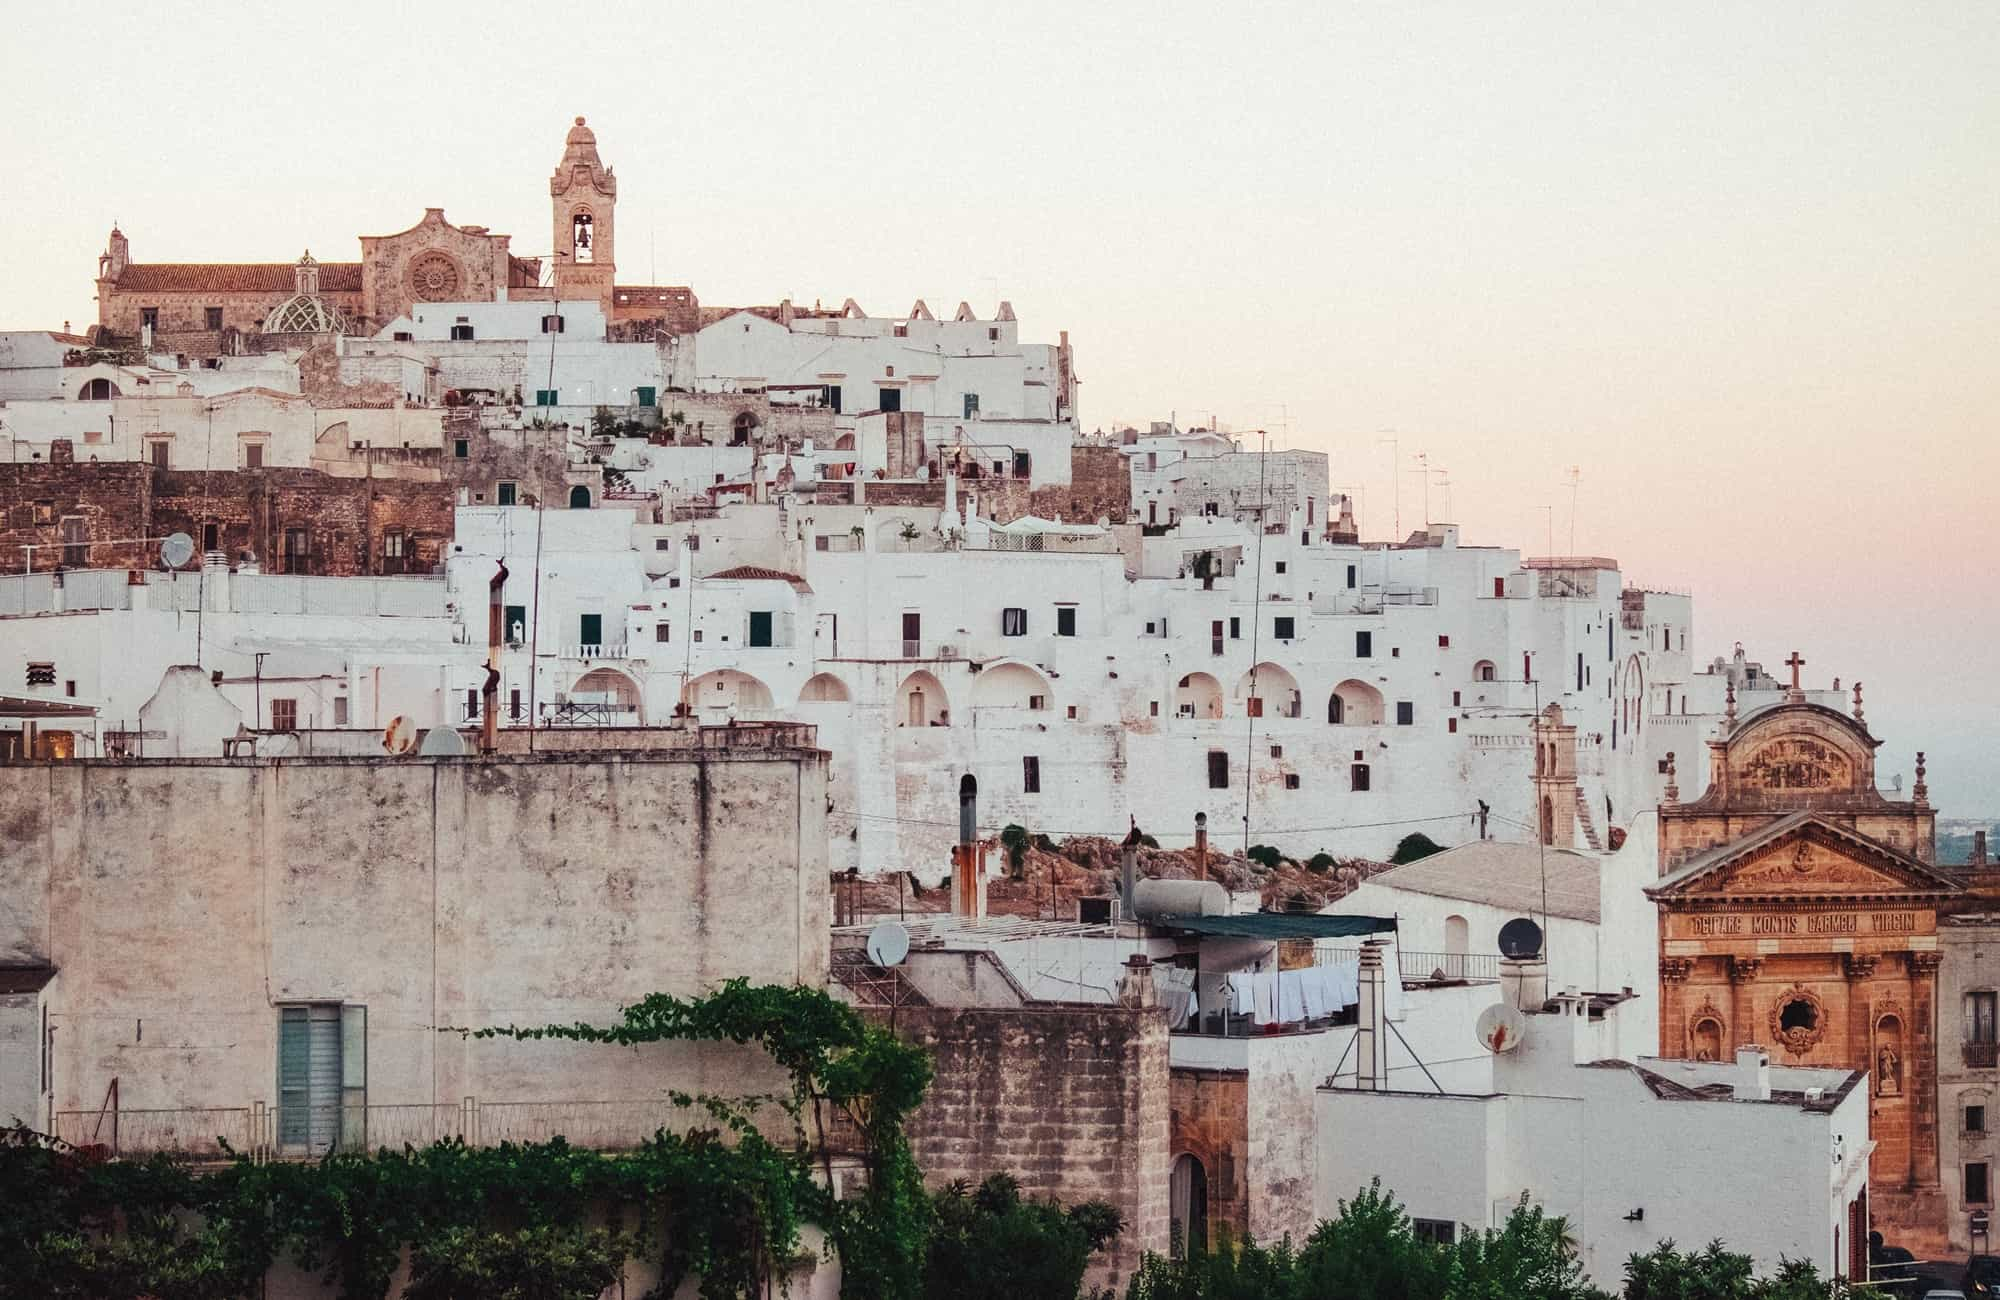 Voyage en Italie - Ostuni - Amplitudes